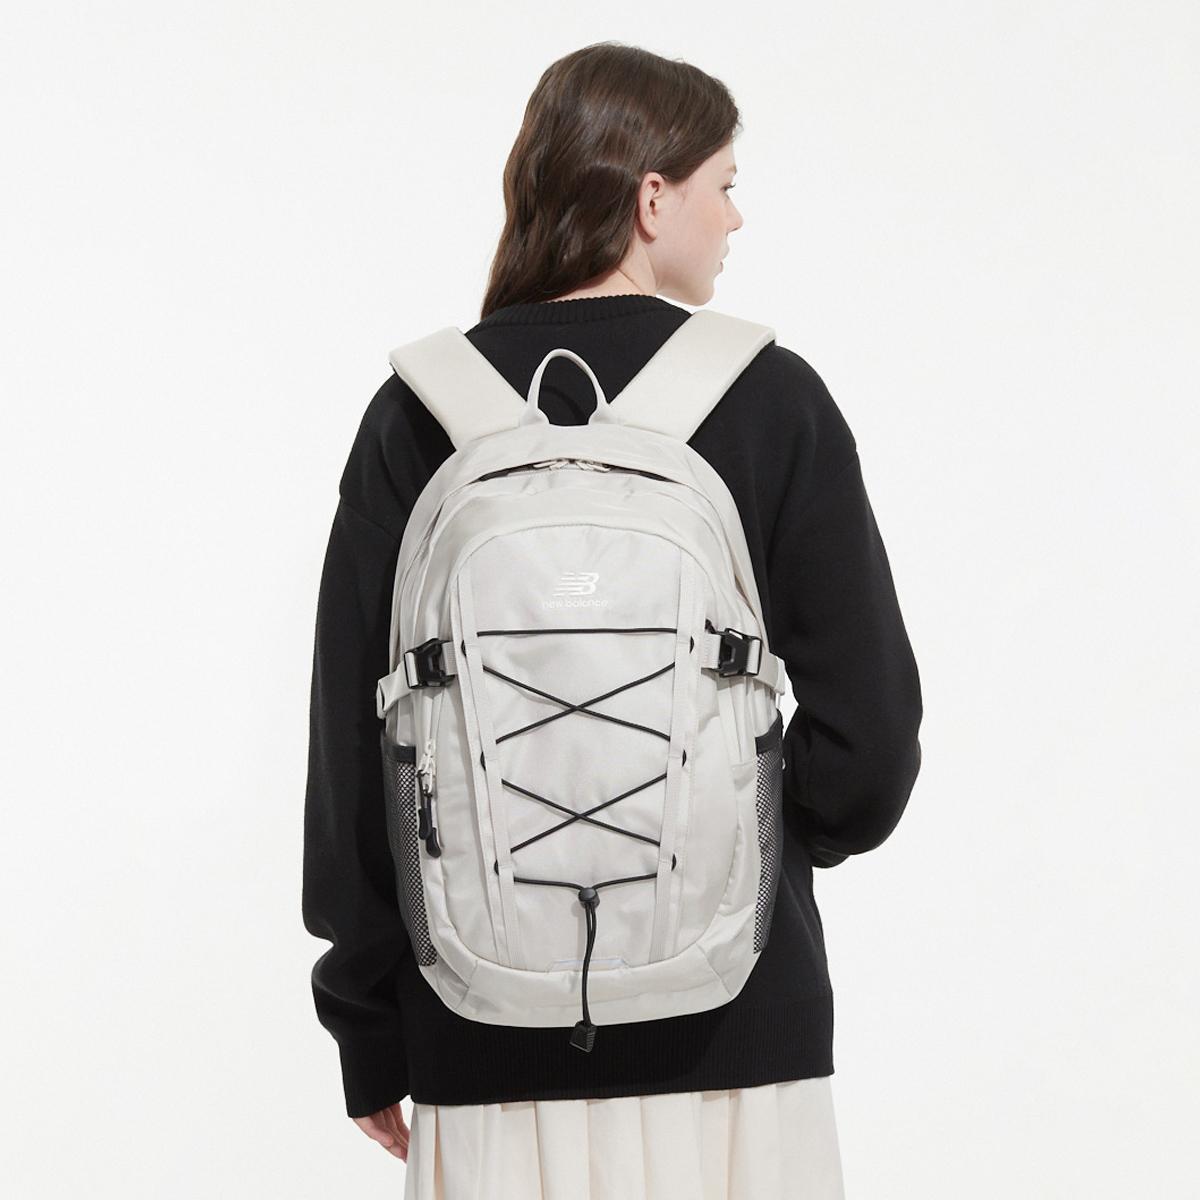 2Pik Mini Backpack